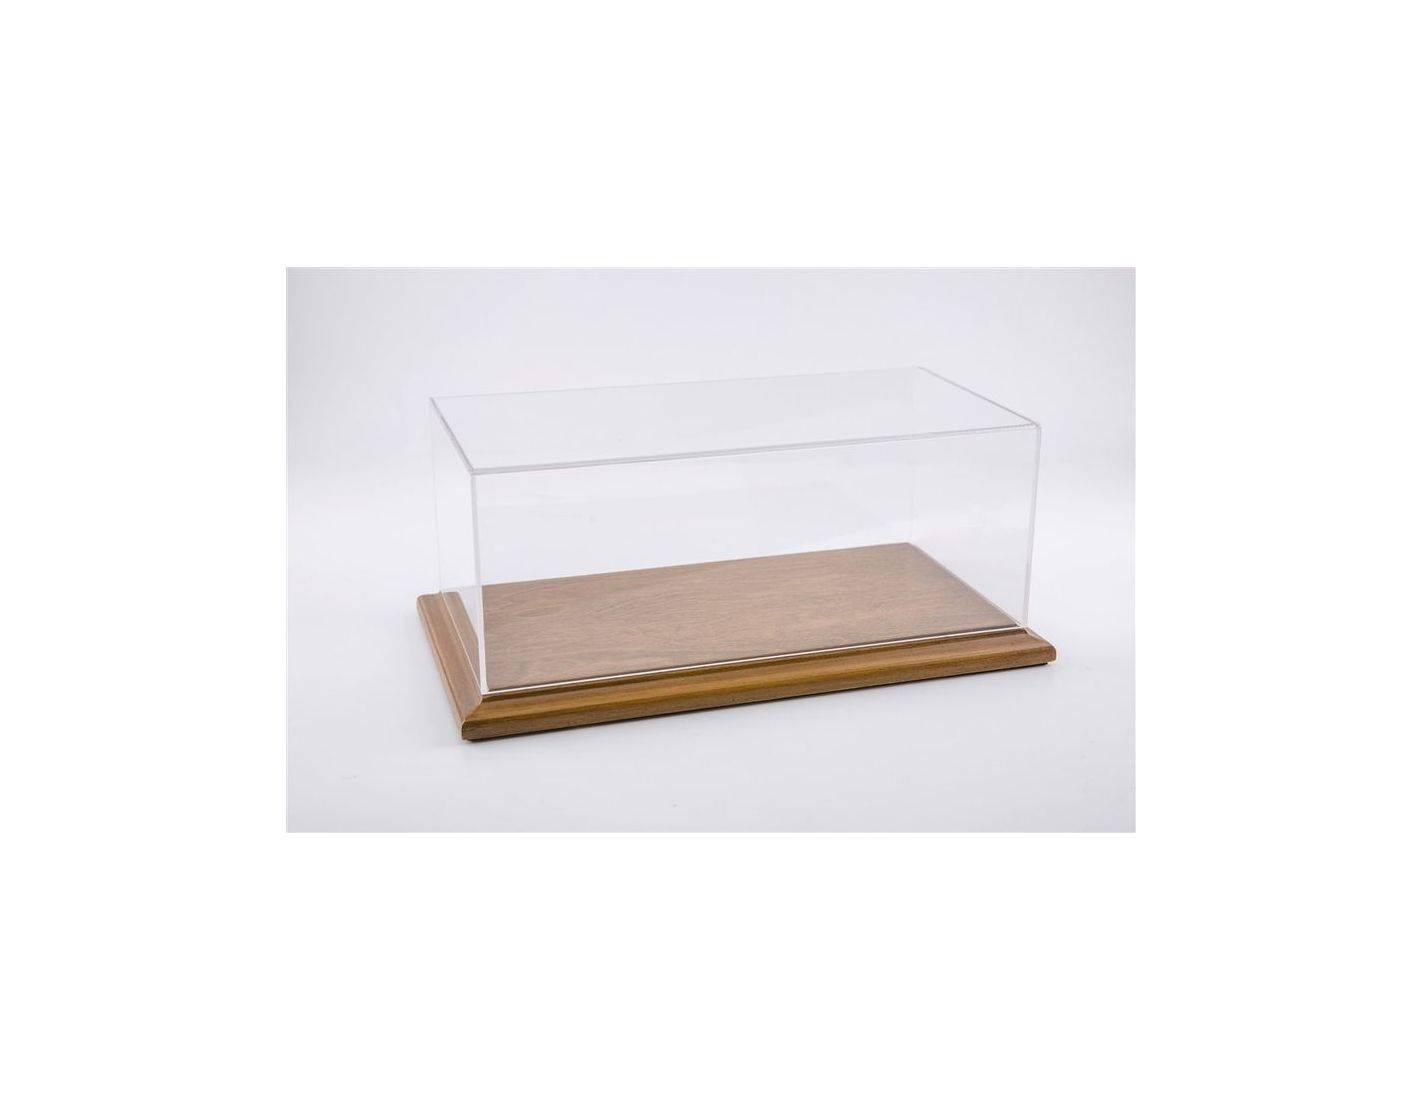 Atlantic ATL10064 MOLSHEIM DISPLAY CASE W/NOCE WOOD BASE (WIDE EDGE) mm 230x120x85 1:24 Modellino